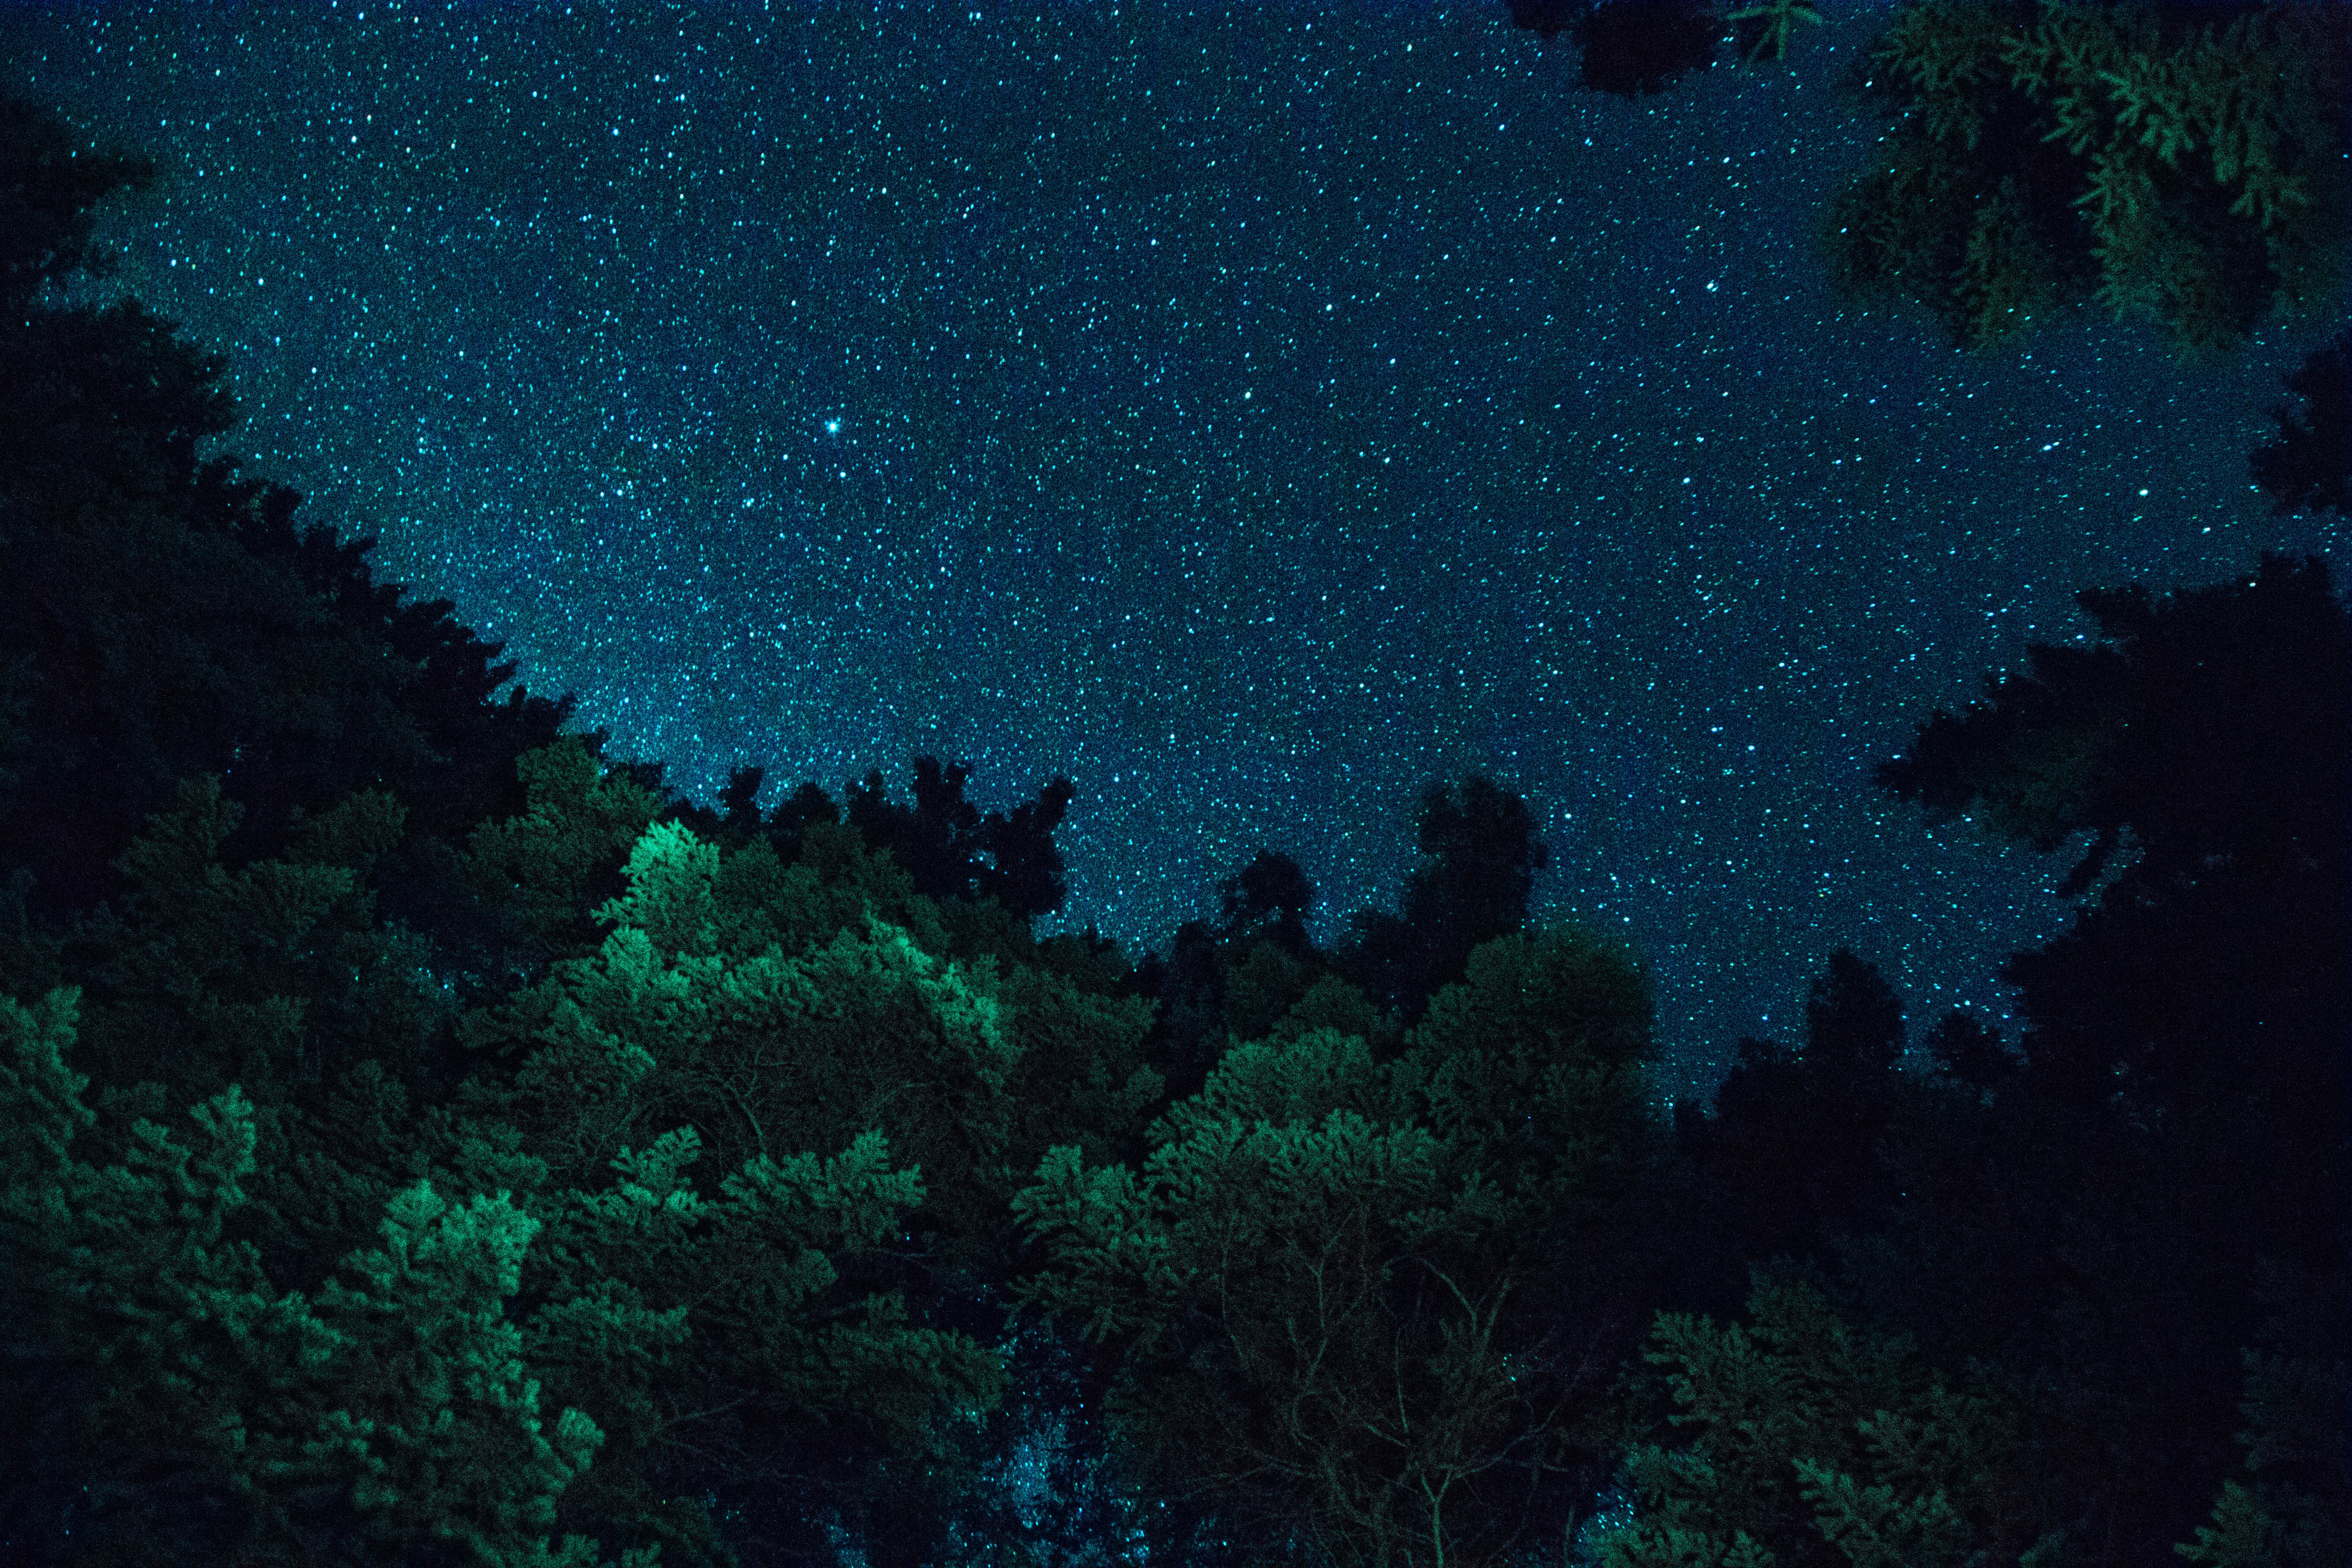 green leafed trees under black sky